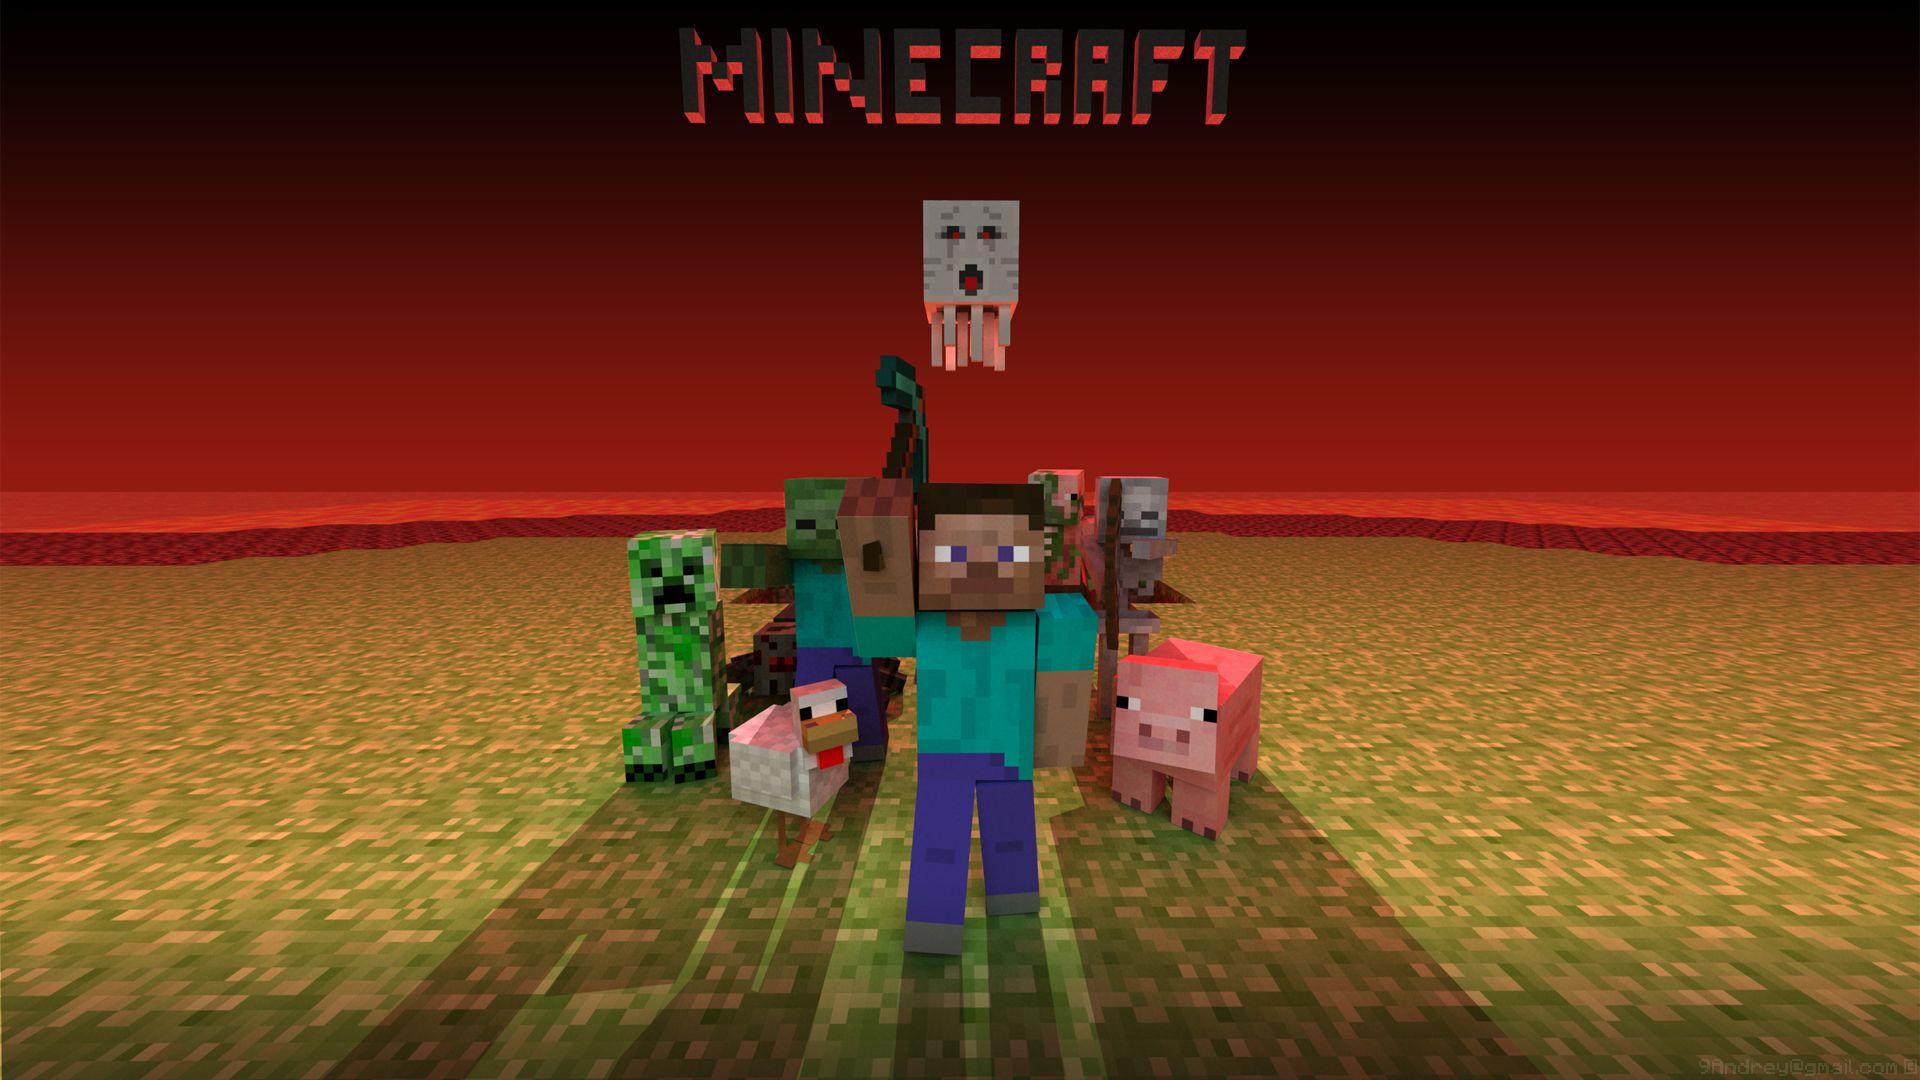 Most Inspiring Wallpaper Minecraft Google - edf1ac6c8e6530a45f47e1539e5ddadb  Picture_425455.jpg